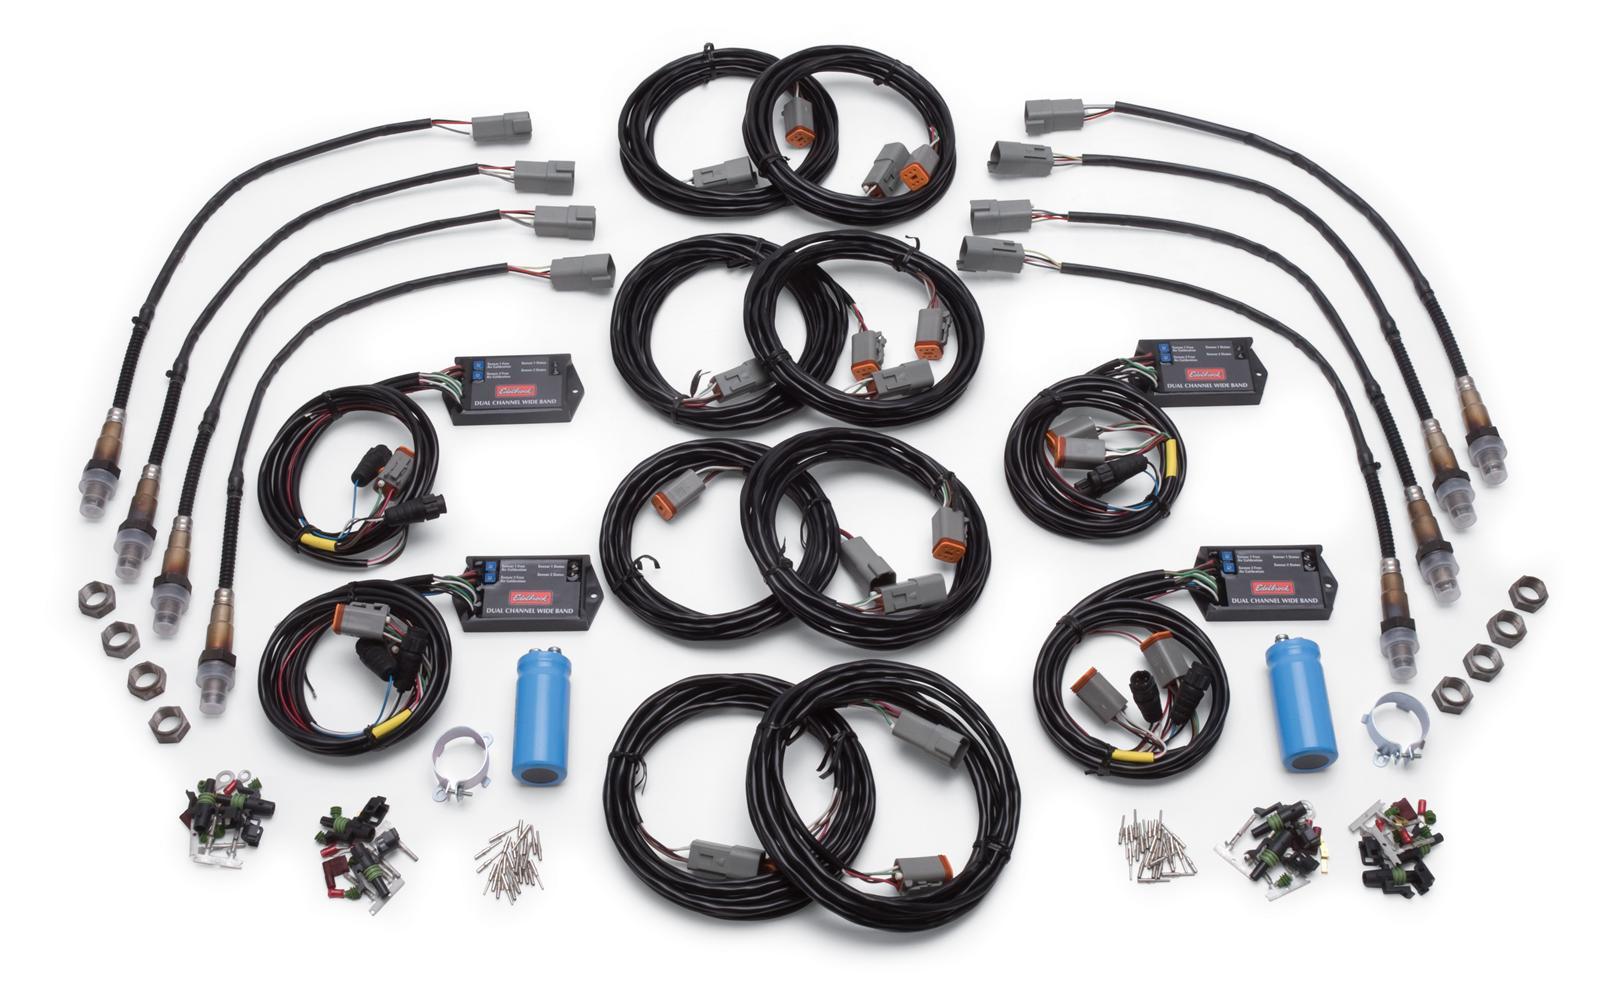 Edelbrock Qwikdata 2 8 Channel Wideband Air Fuel Ratio Monitor Kits